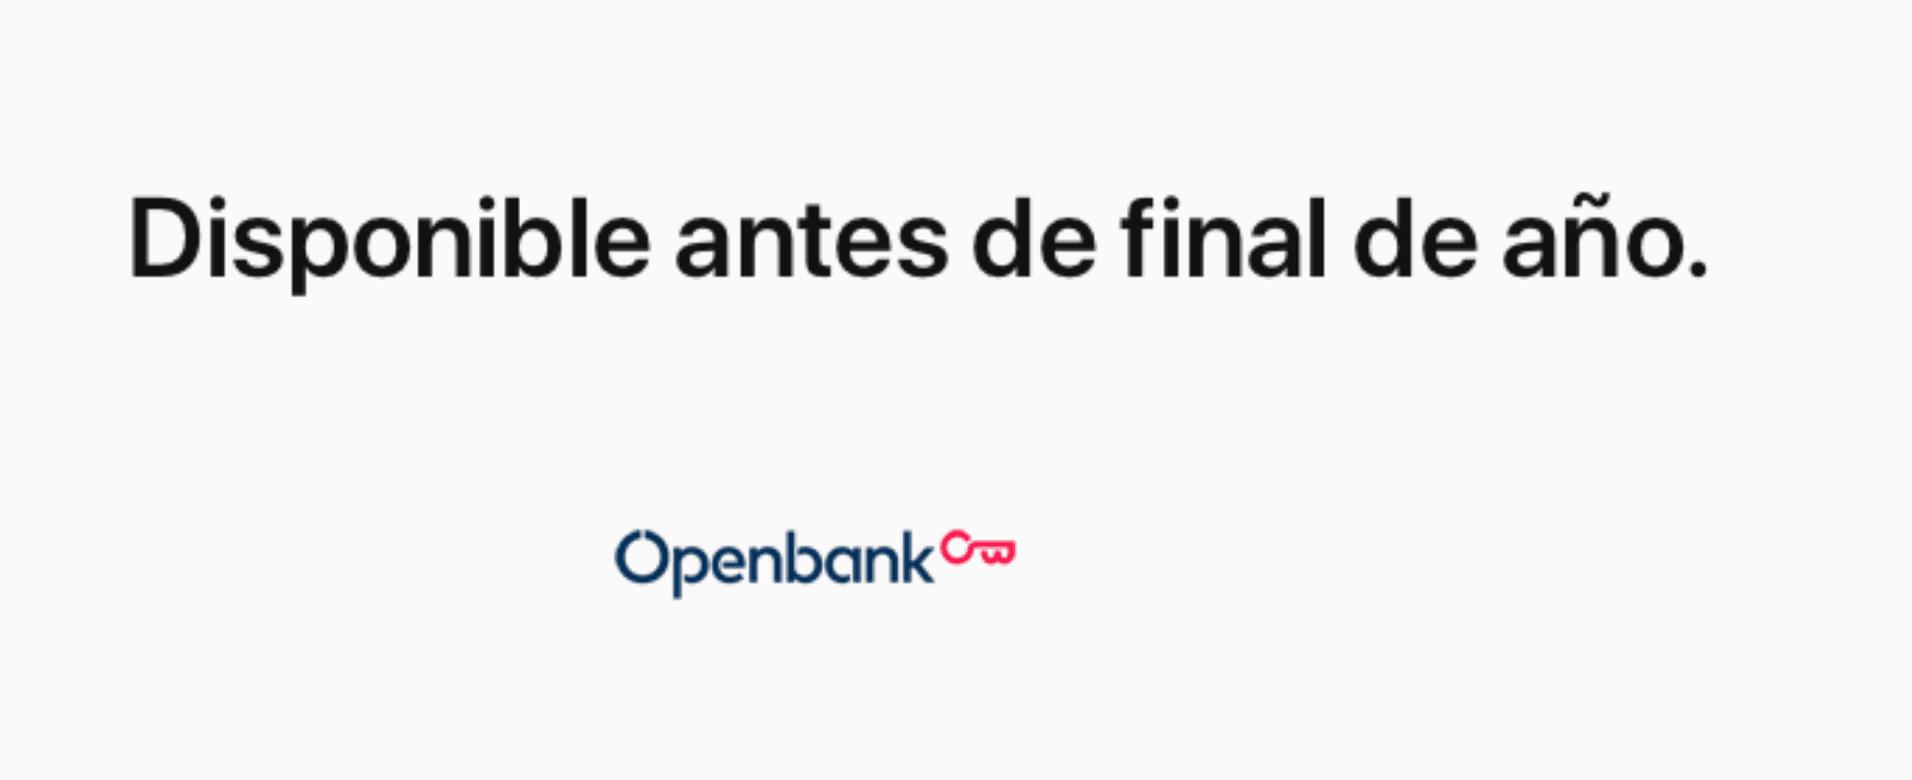 OpenBanck Pay